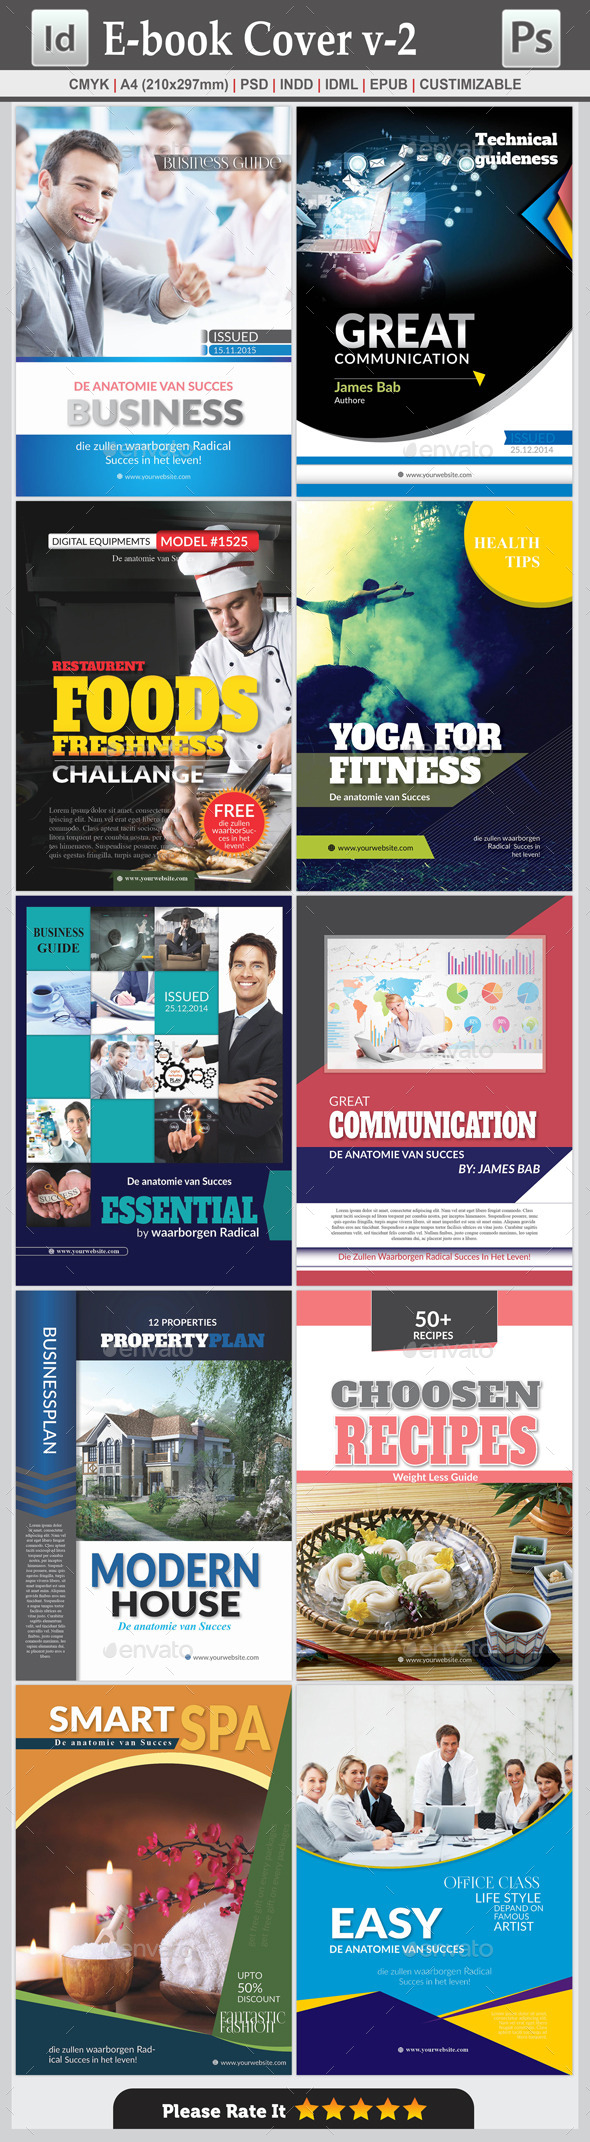 E-Book Cover v-2 - Digital Books ePublishing